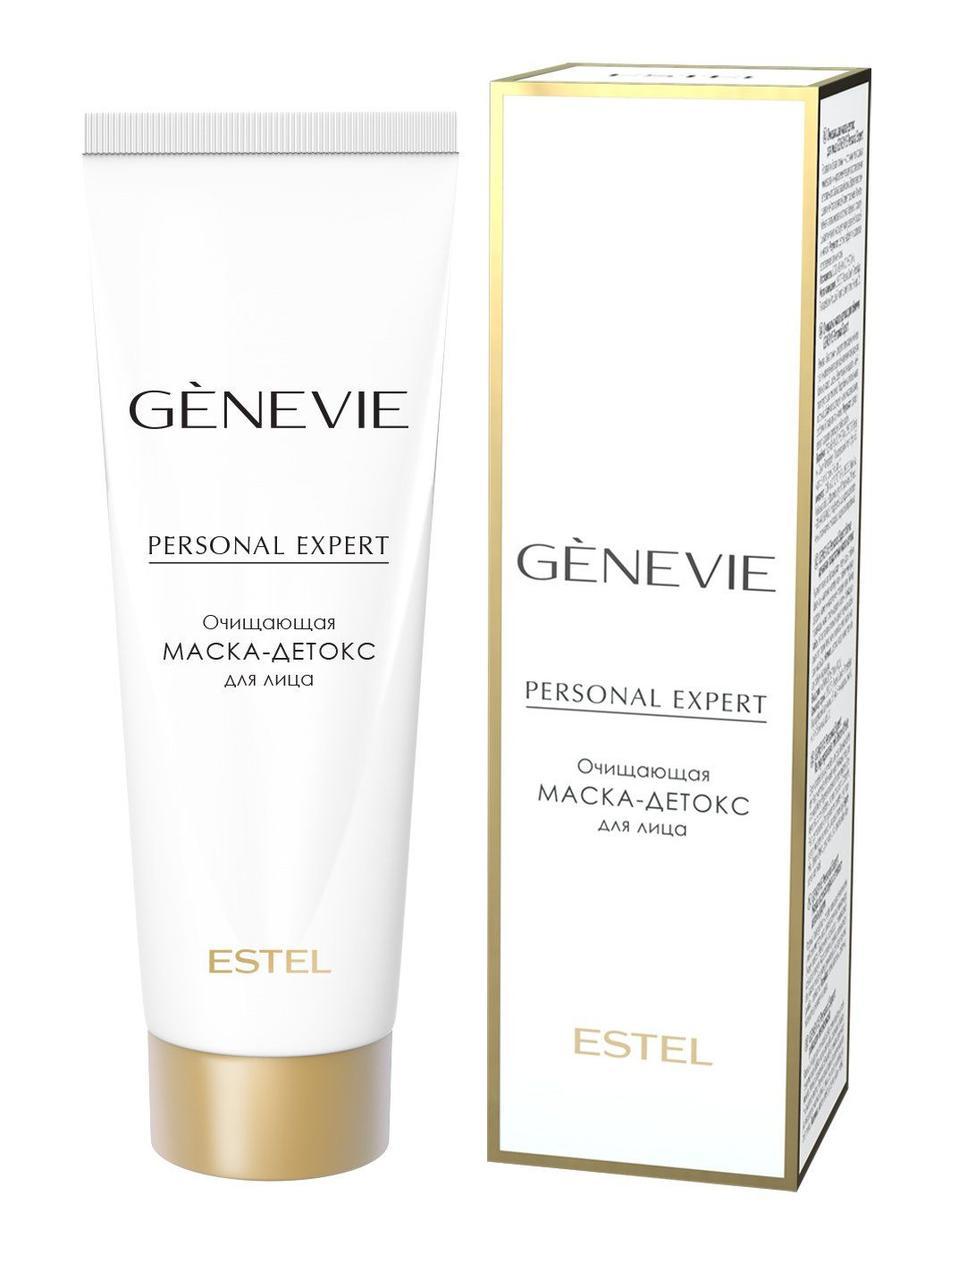 Очищаюча маска-детокс для обличчя GENEVIE Personal Expert , 50ml